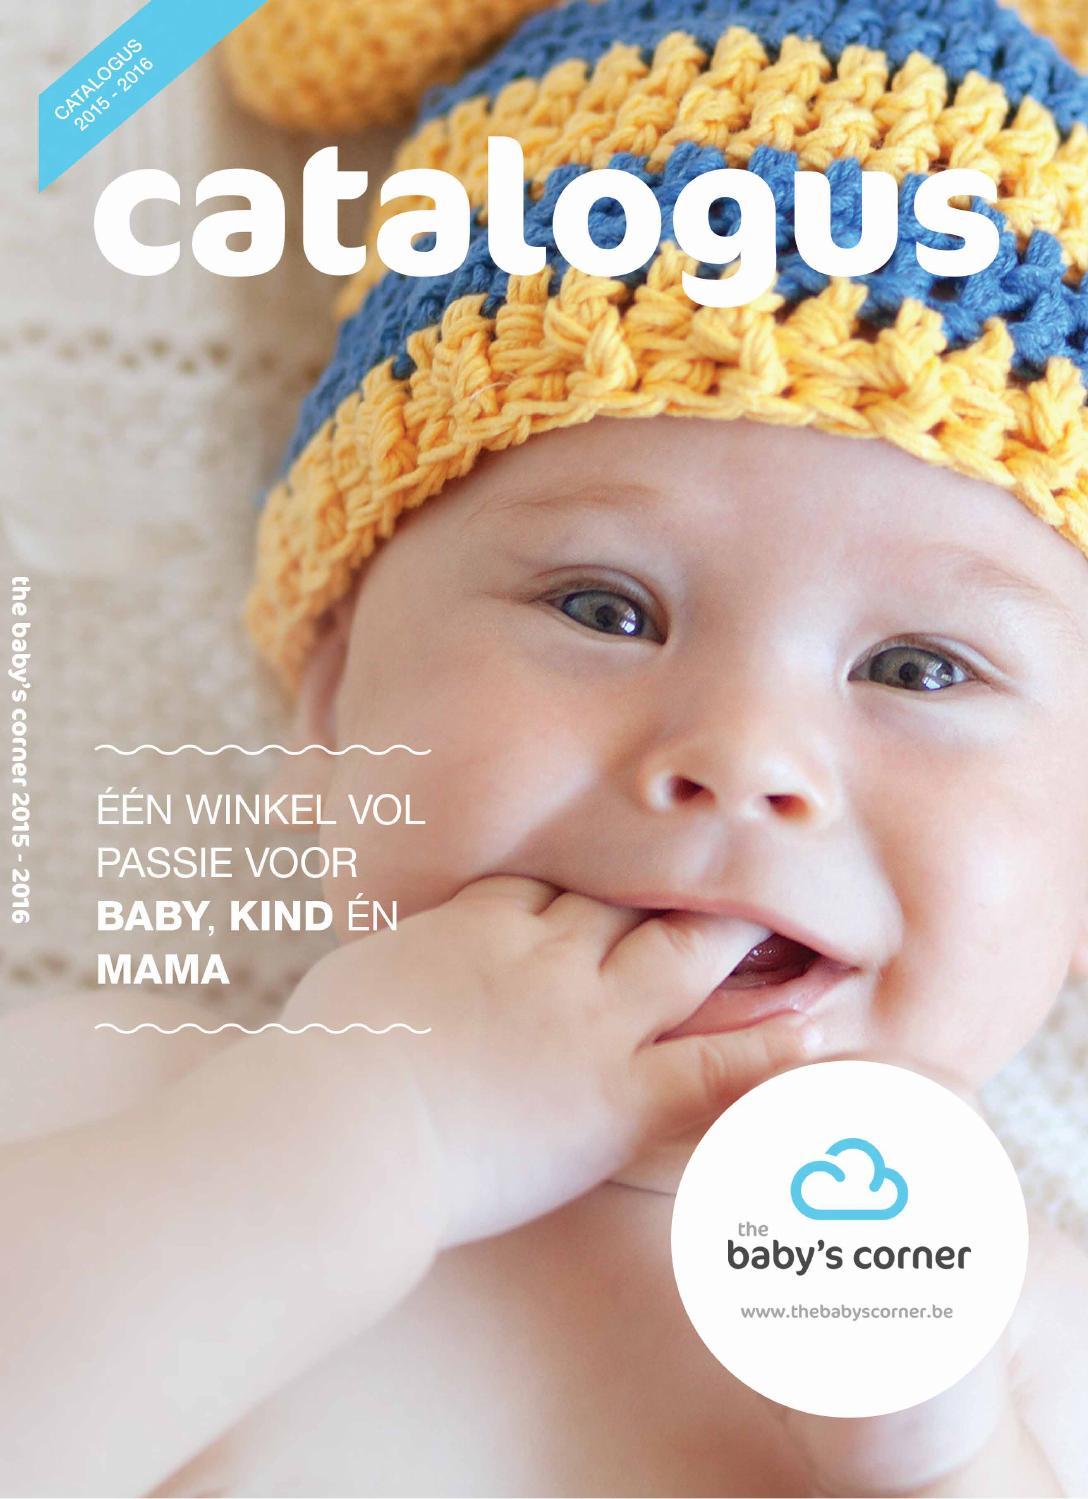 Babybed opmaken zomer - Catalogus 2015 2016 The Baby S Corner By Webatvantage Bvba Btw Be 0474 306 343 Issuu